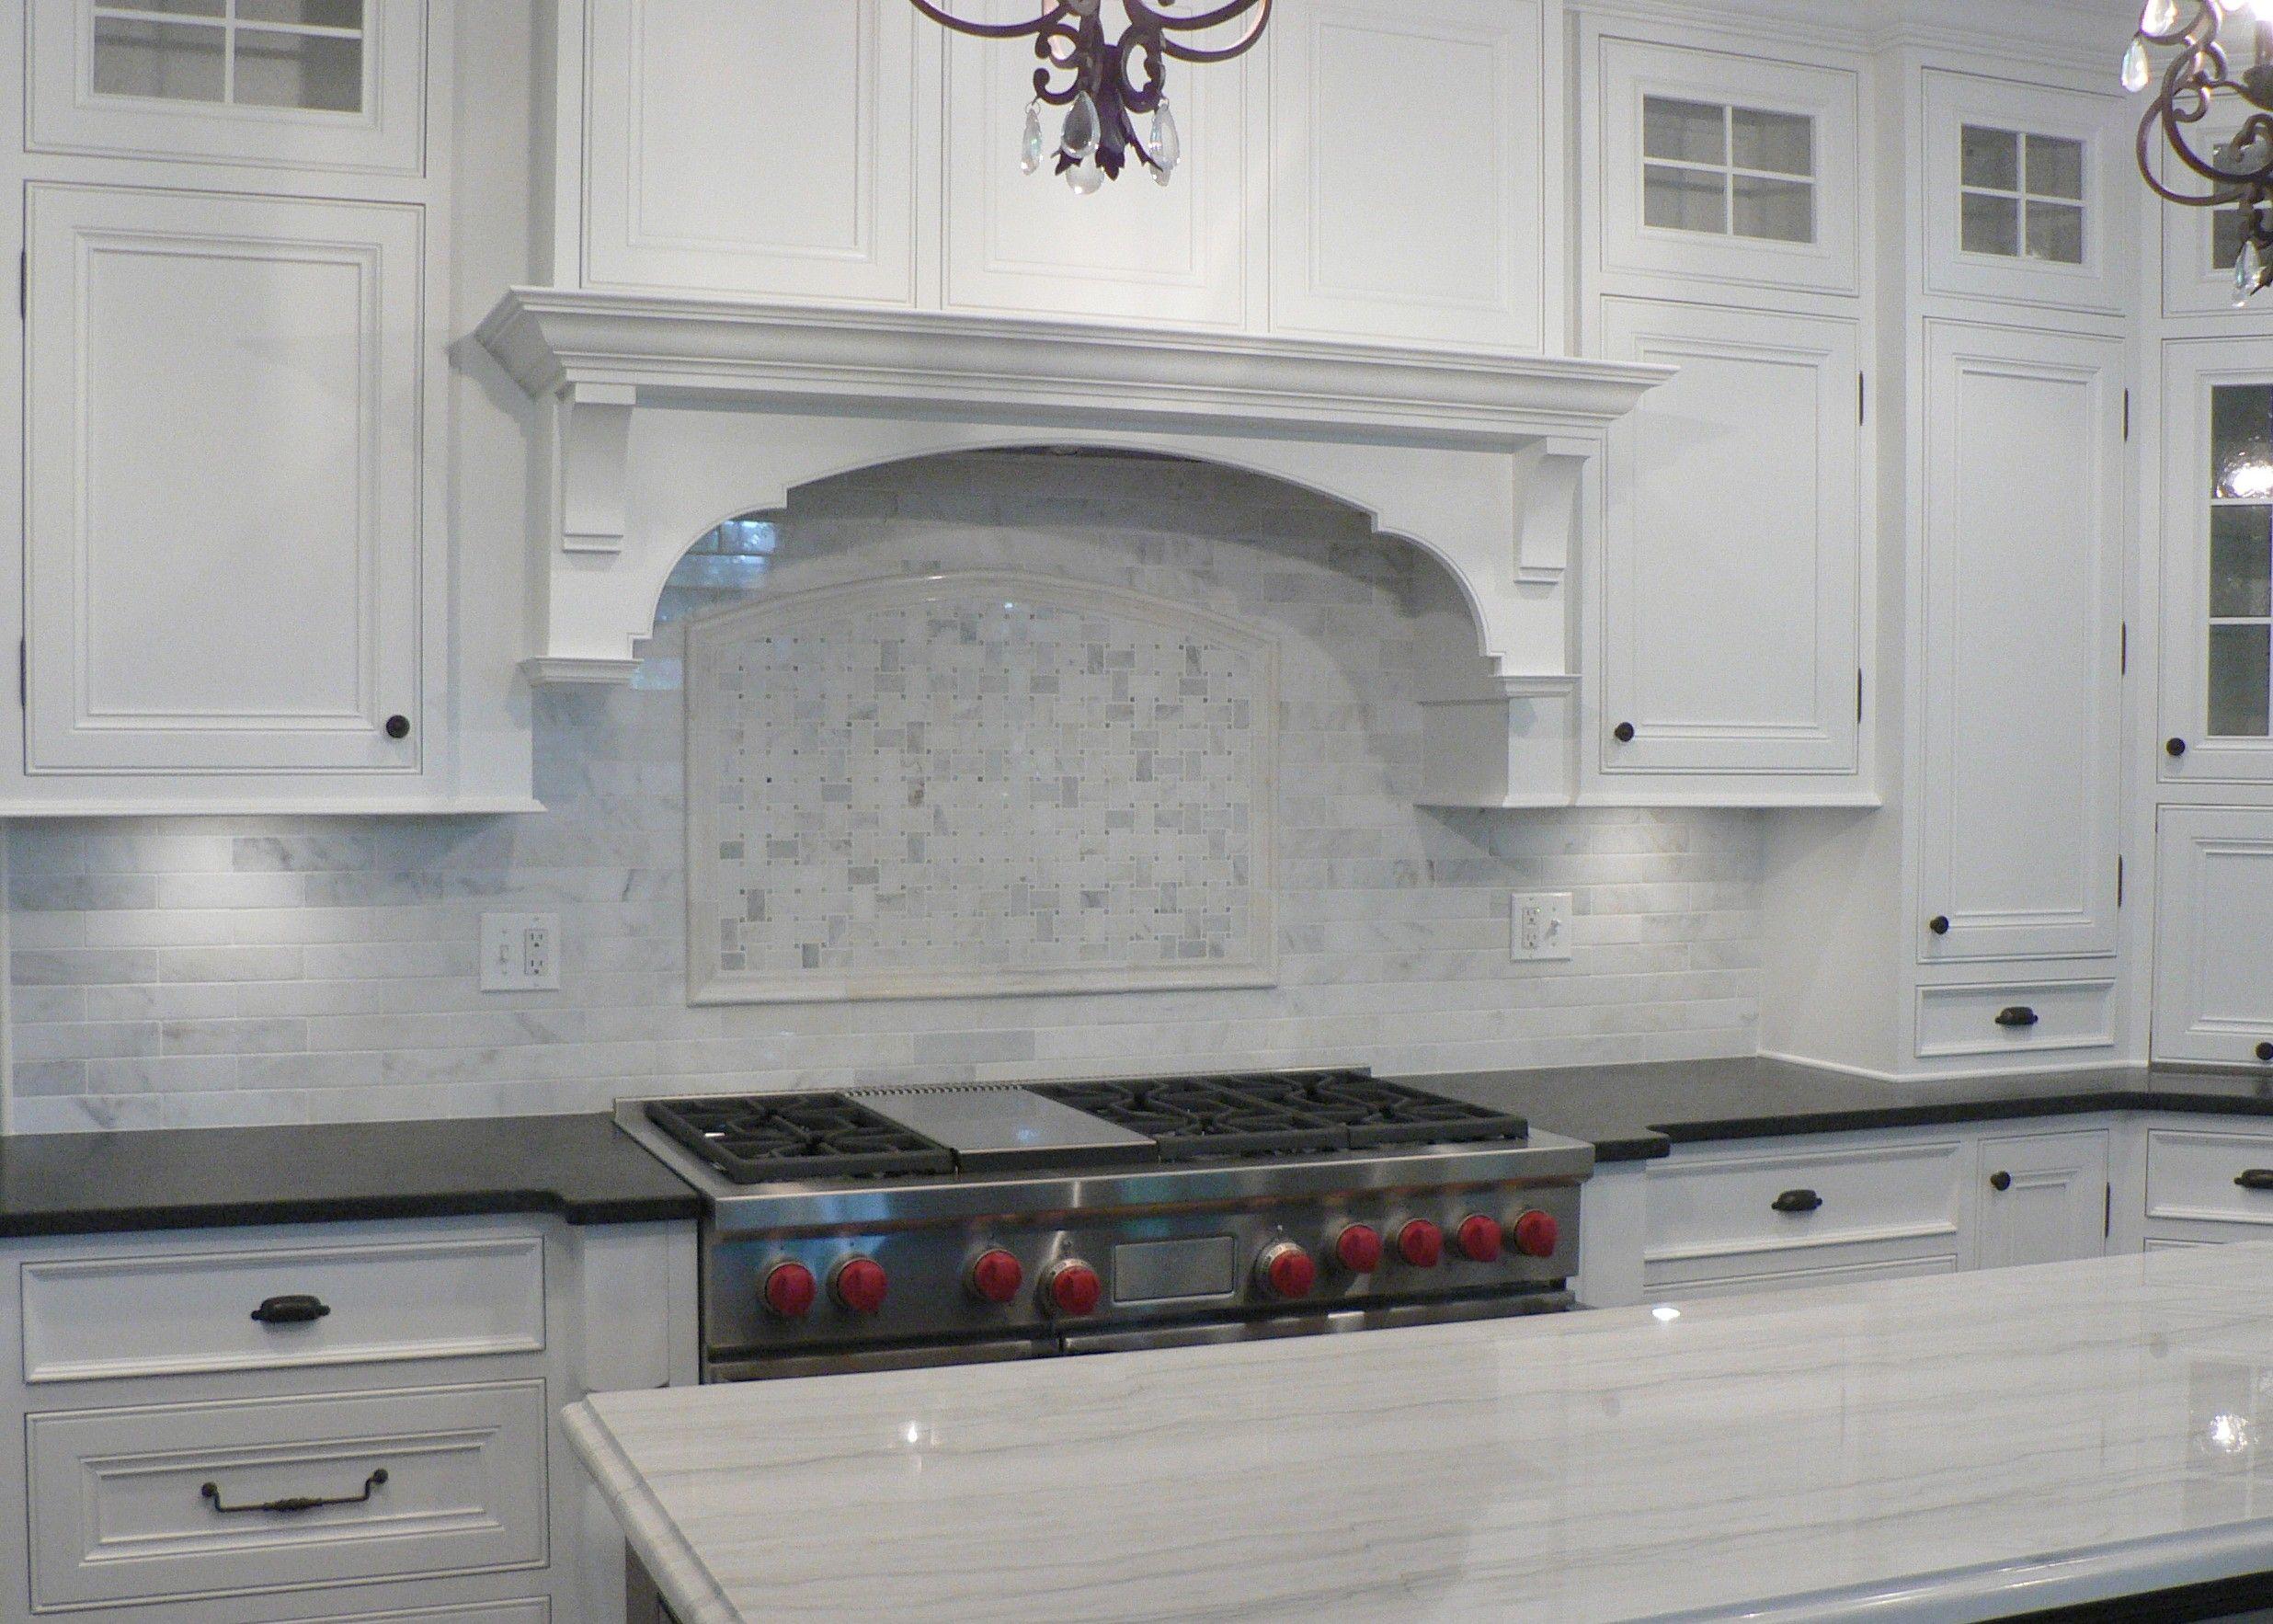 Marvelous Marble Tile Backsplash Ideas Part - 2: White Carrera Marble Backsplash · Backsplash IdeasTile ...